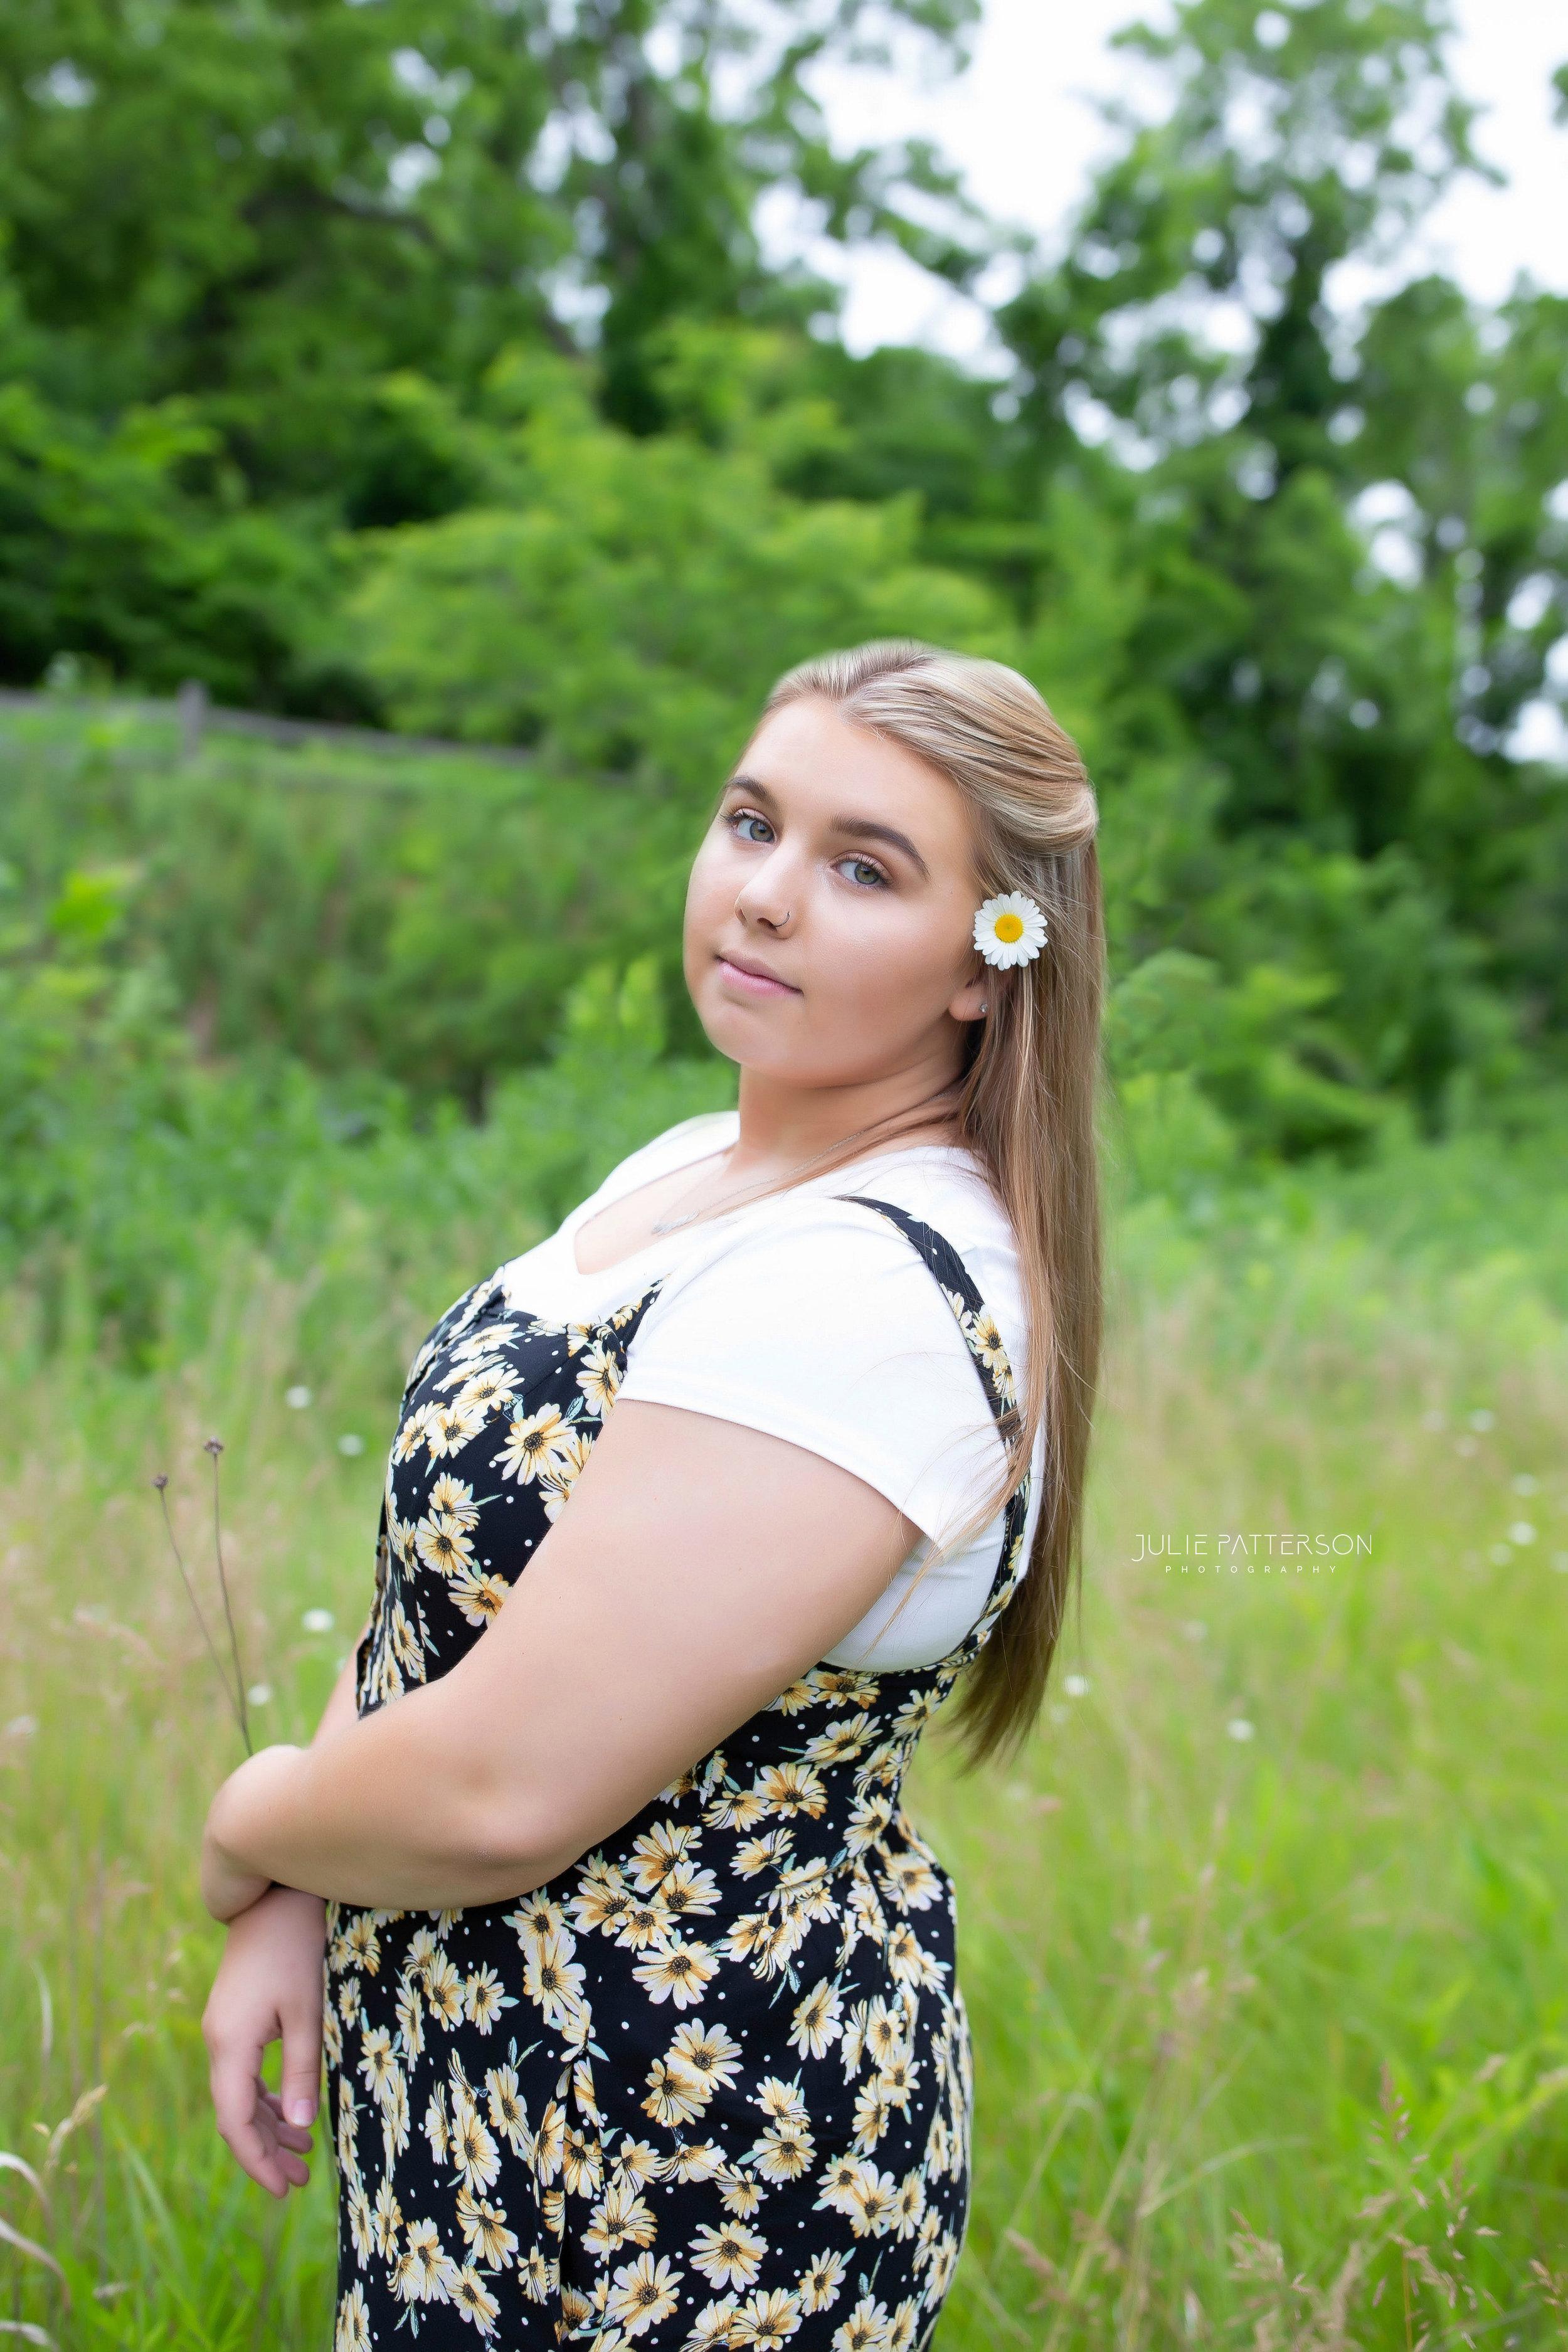 Julie Patterson Photography Garden City Michigan High School Senior Photographer Ann Arbor Milan Saline Plymouth Northville Canton